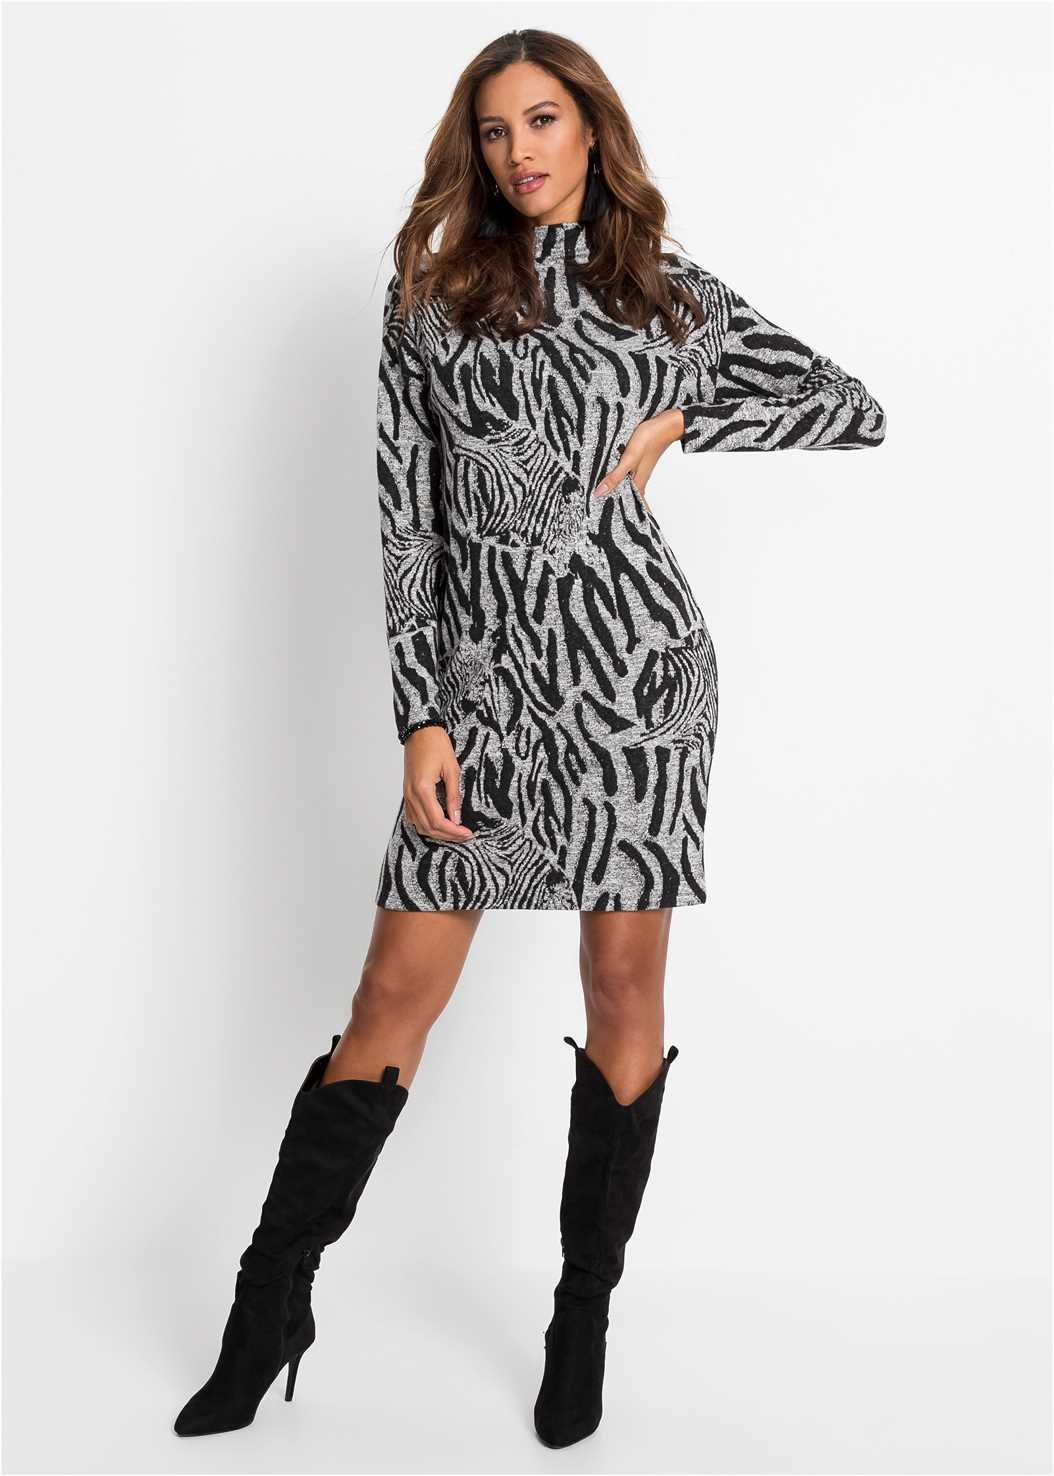 Zebra Printed Sweater Dress,Seamless Unlined Bra,Heel Embellished Boot